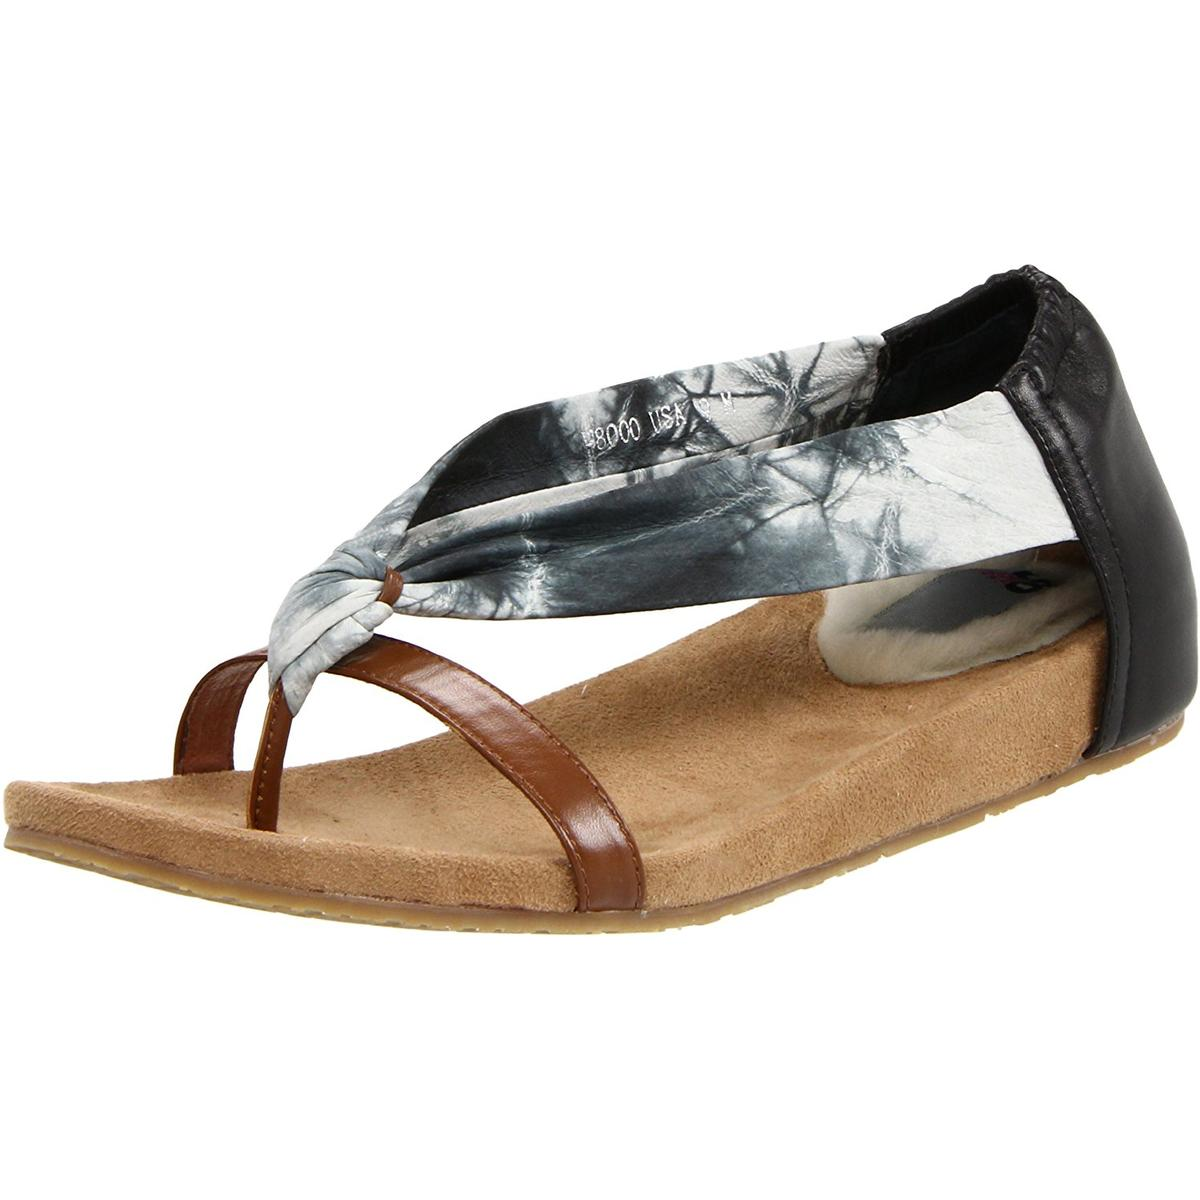 Lamo Up-Tied Womens Black Sandals by Lamo